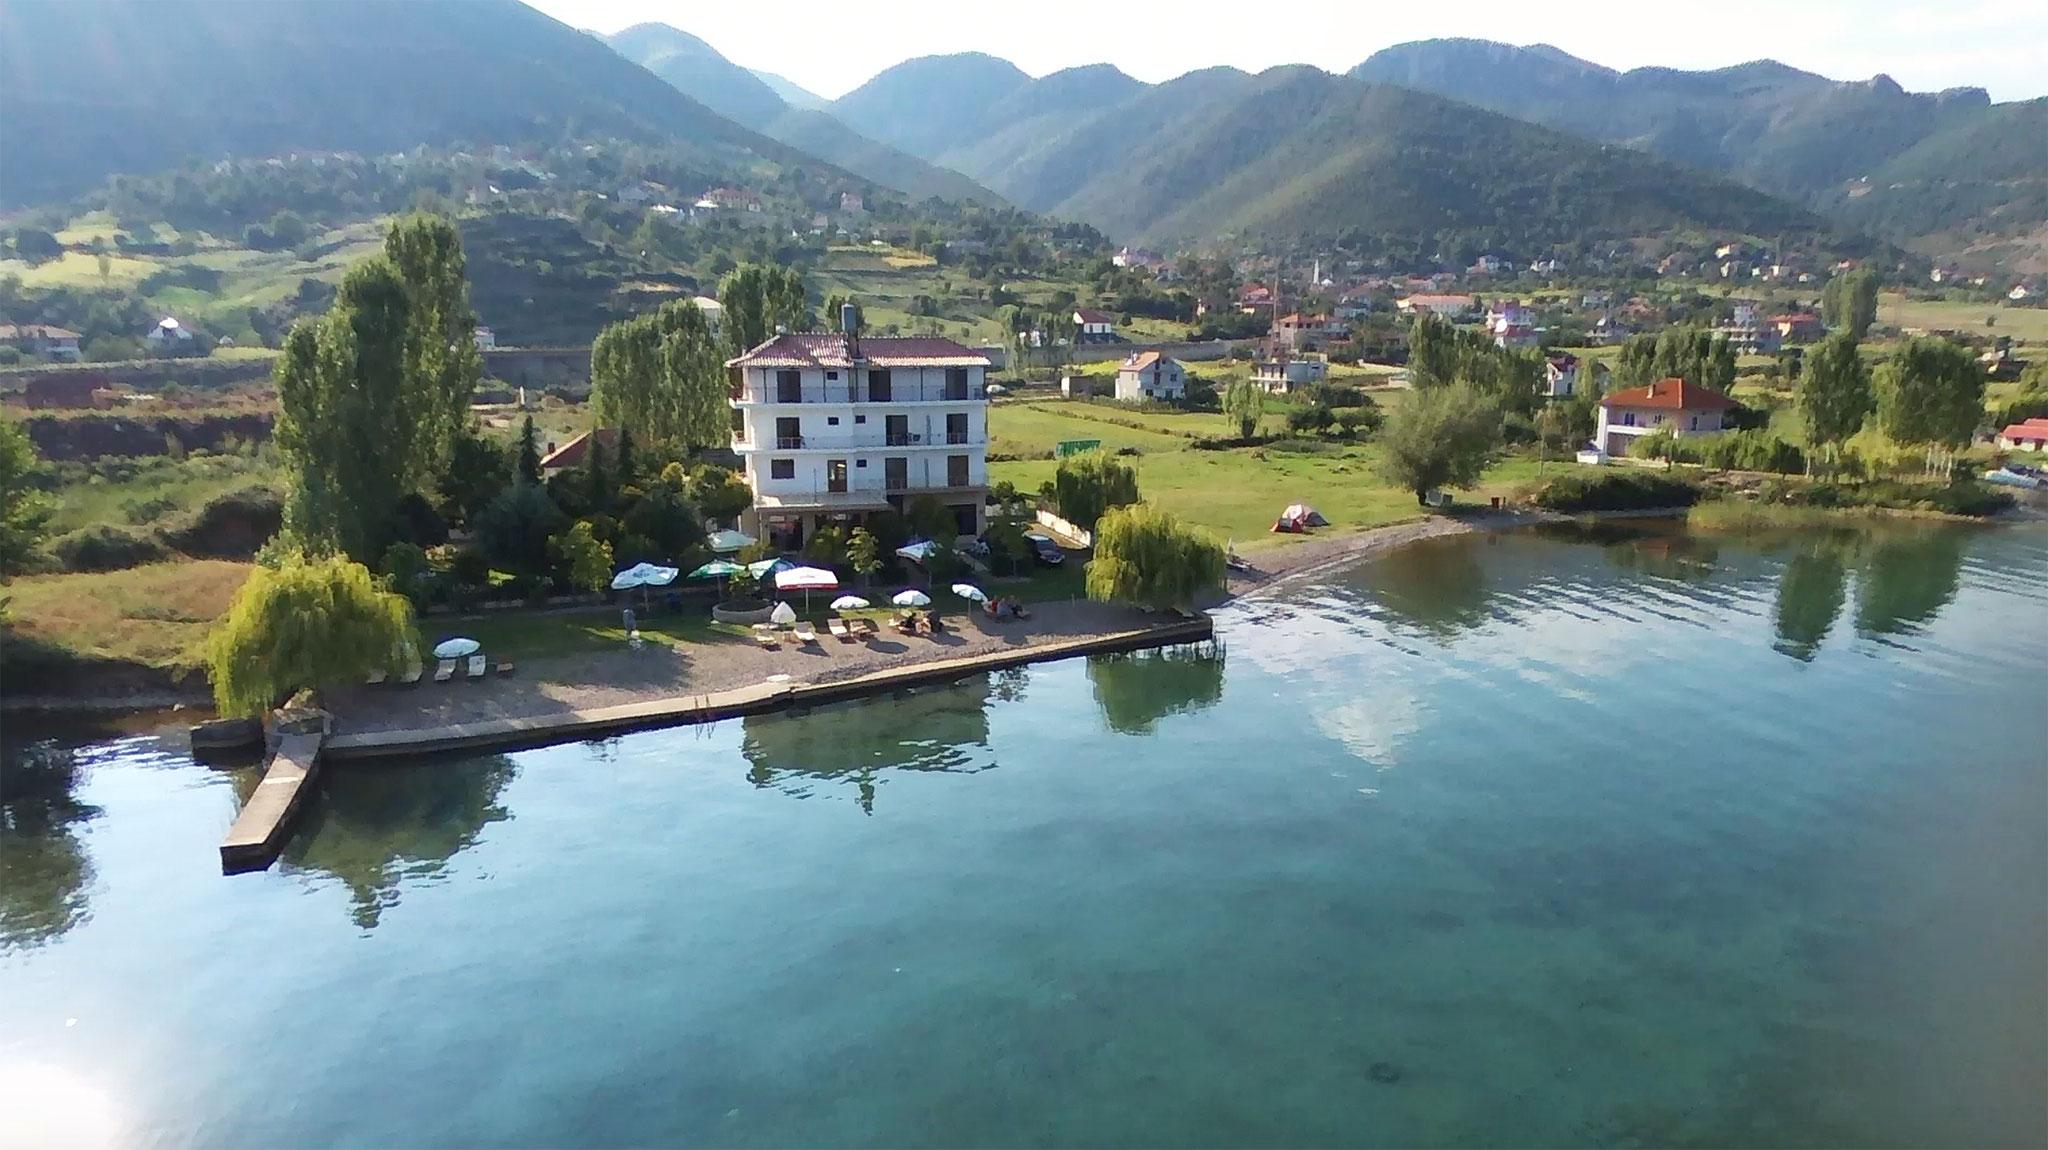 Unser Quartier am Ohridsee